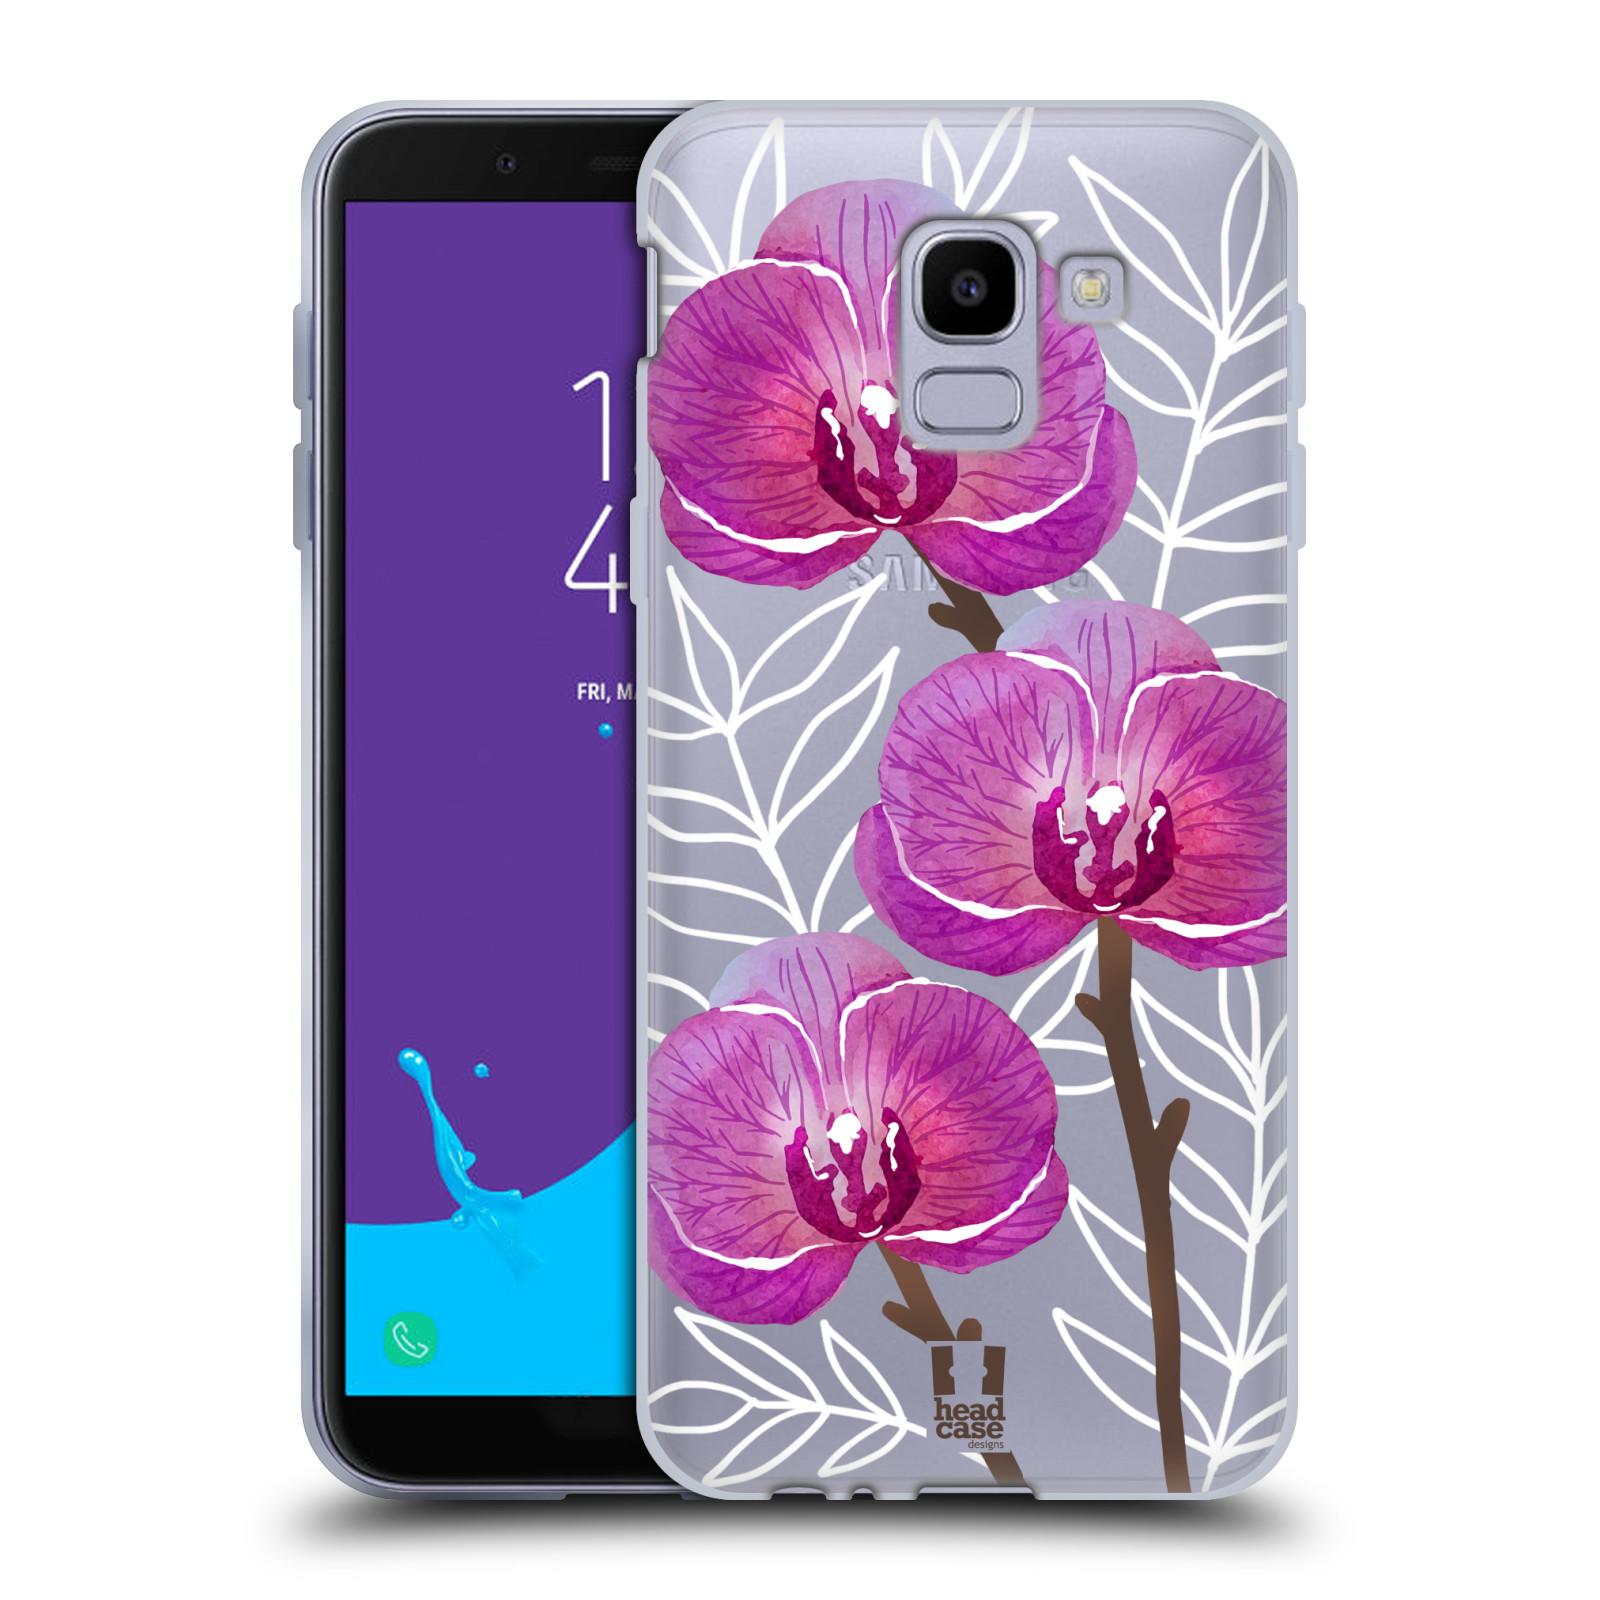 Silikonové pouzdro na mobil Samsung Galaxy J6 (2018) - Head Case - Hezoučké kvítky - průhledné